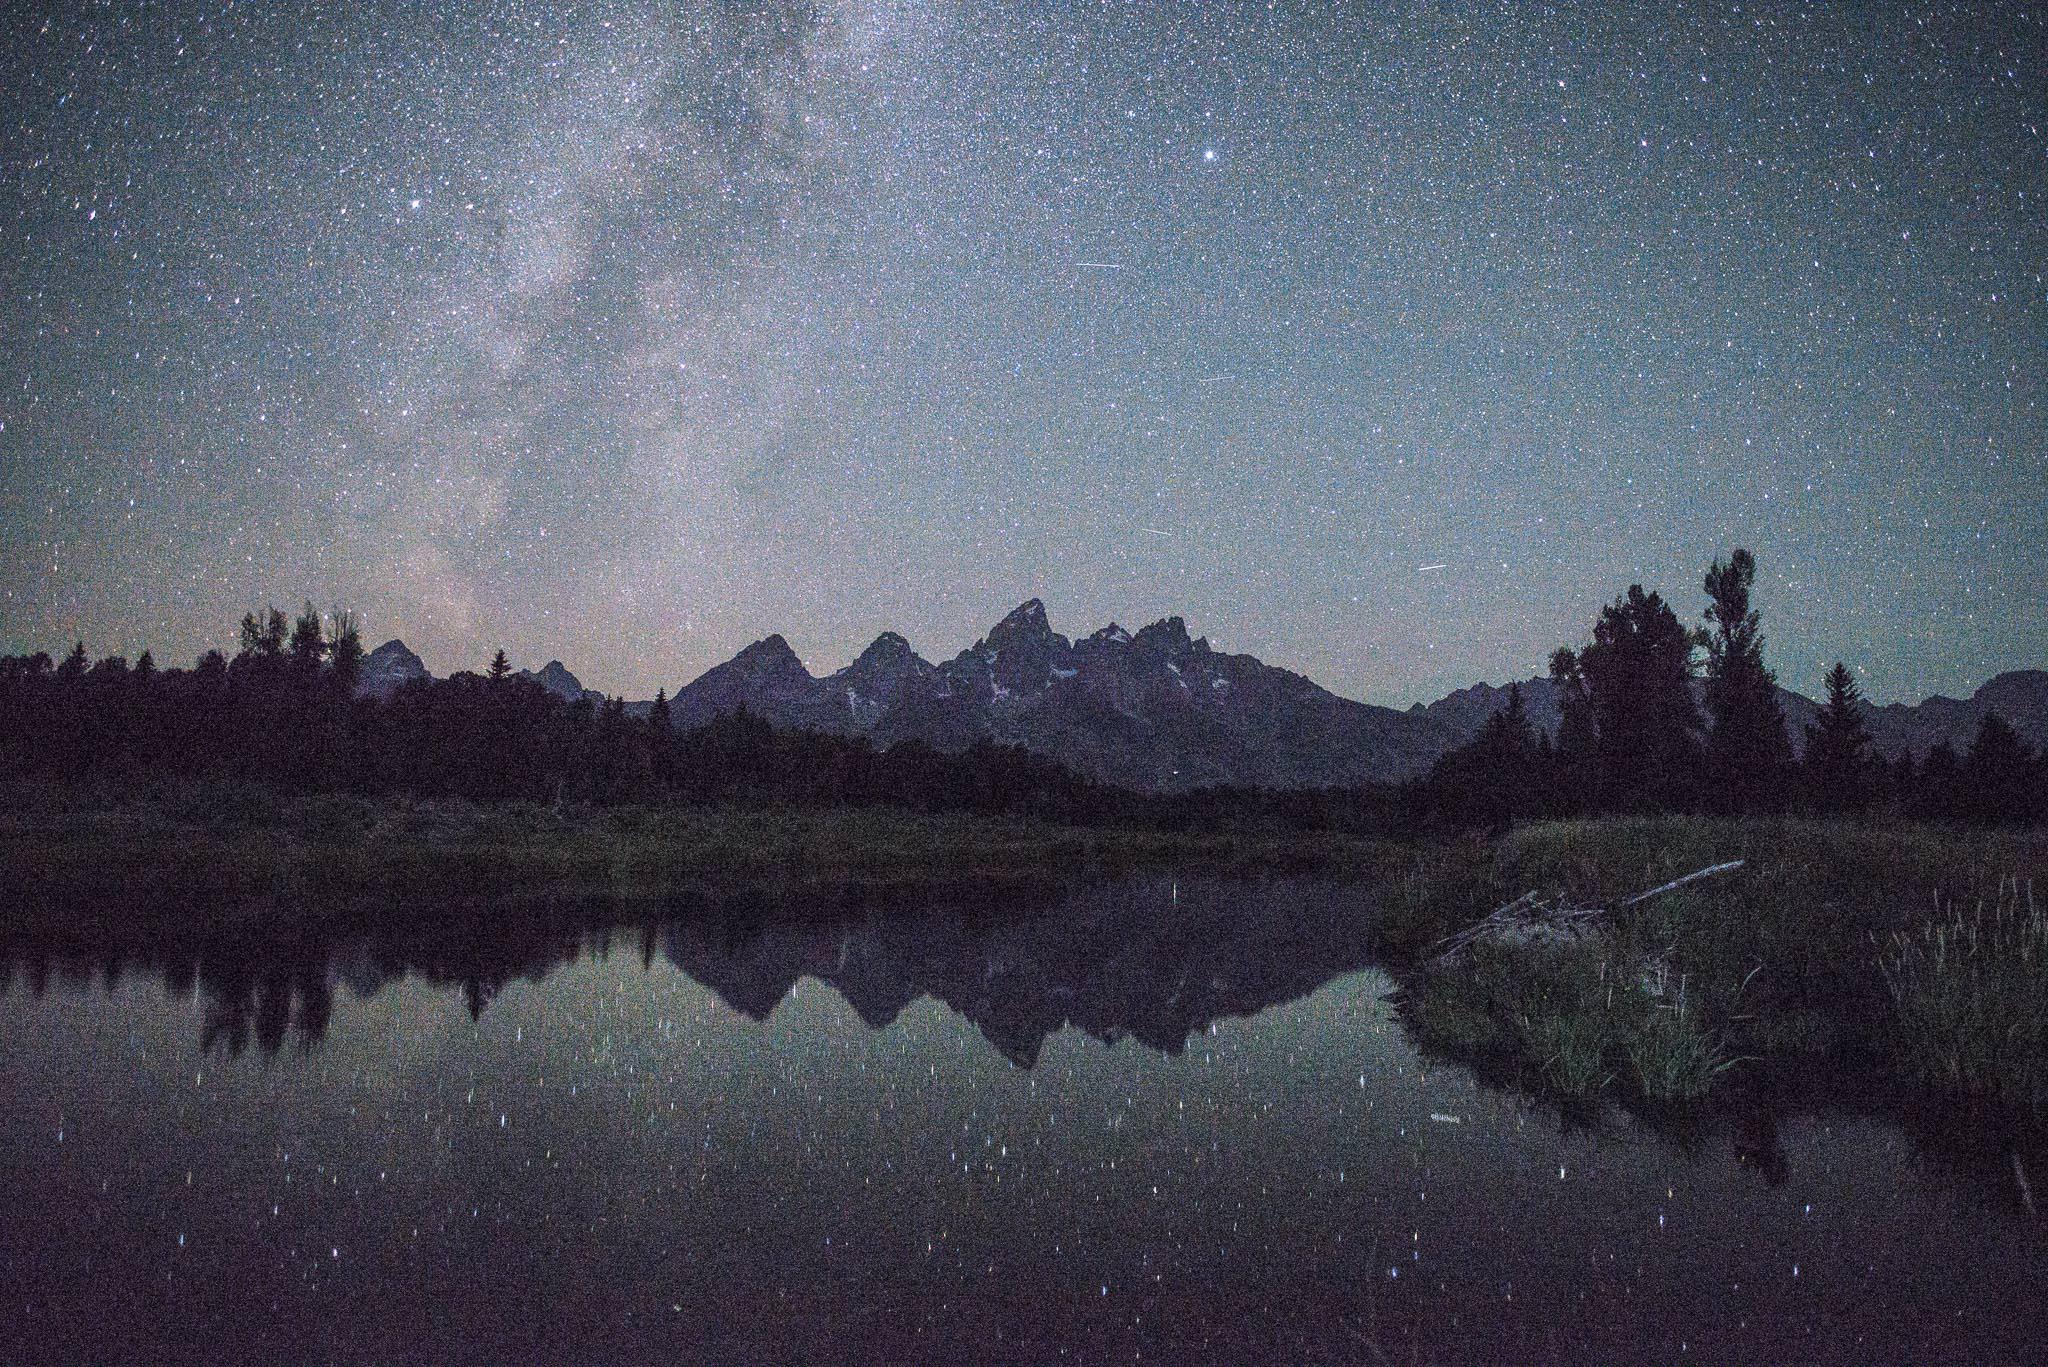 Night landscape photo